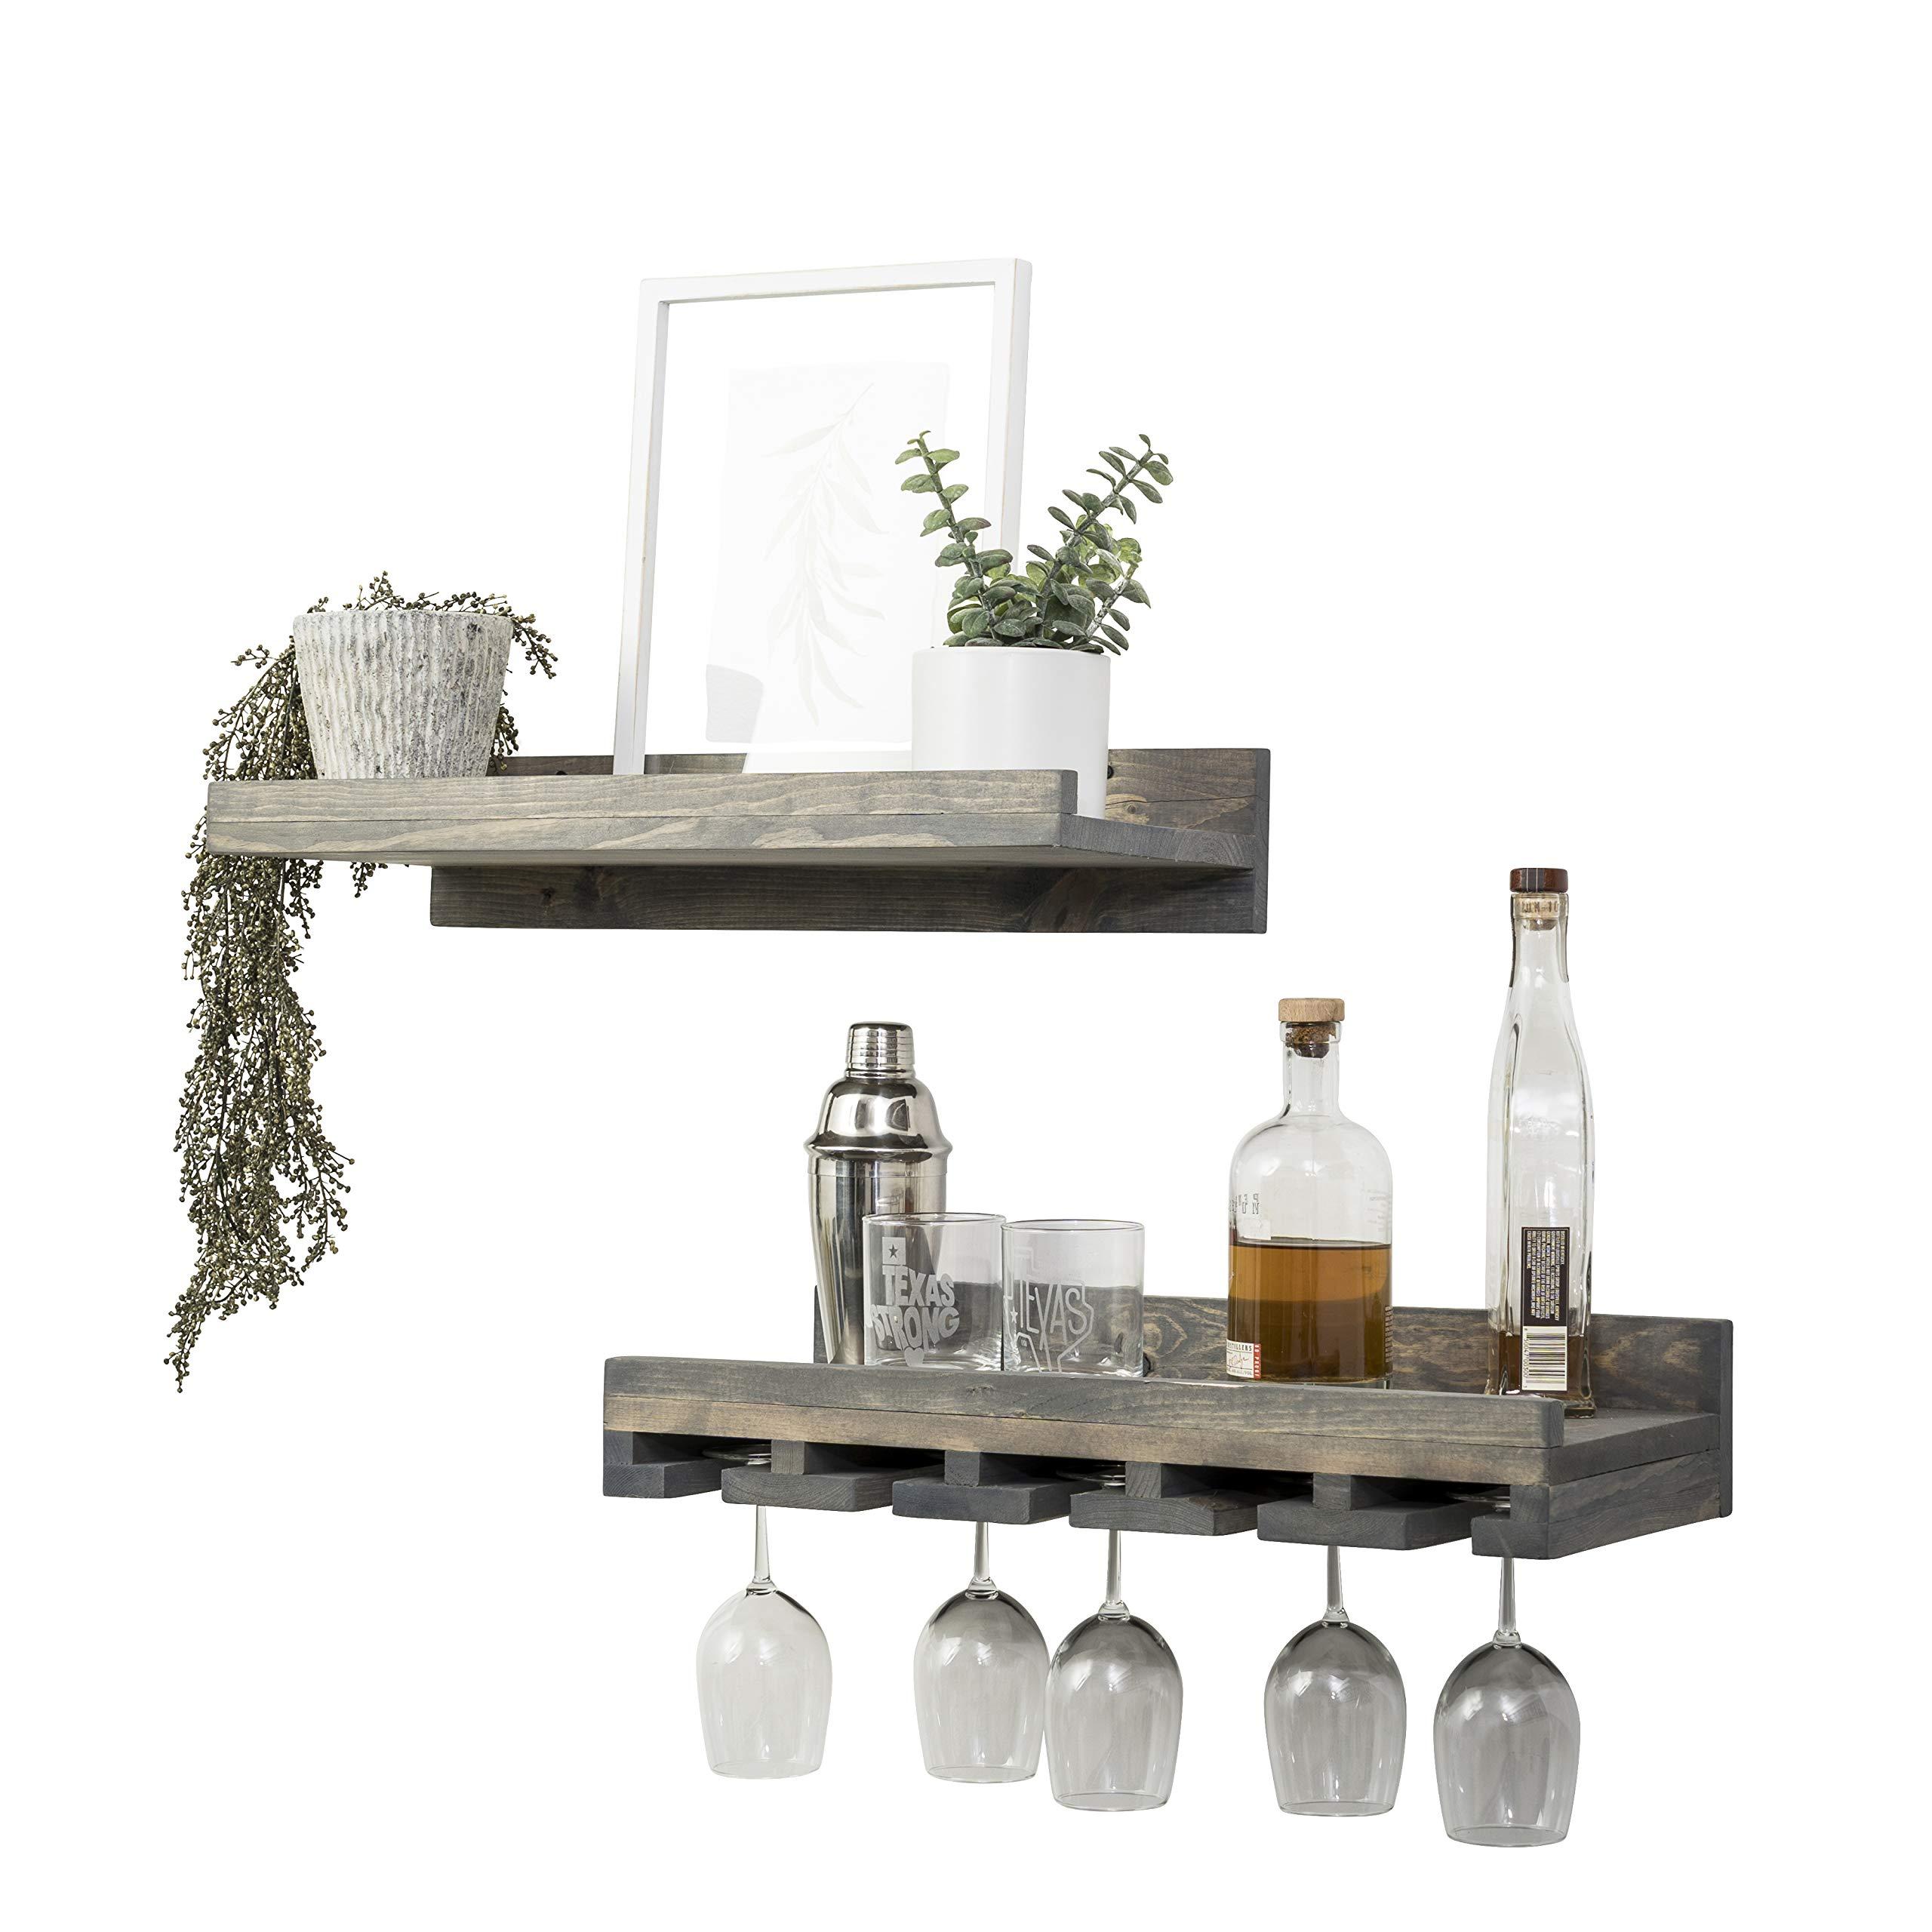 Del Hutson Designs Floating Wine Shelf and Glass Rack Set (Wall Mounted), Rustic Pine Wood Handmade (Grey)